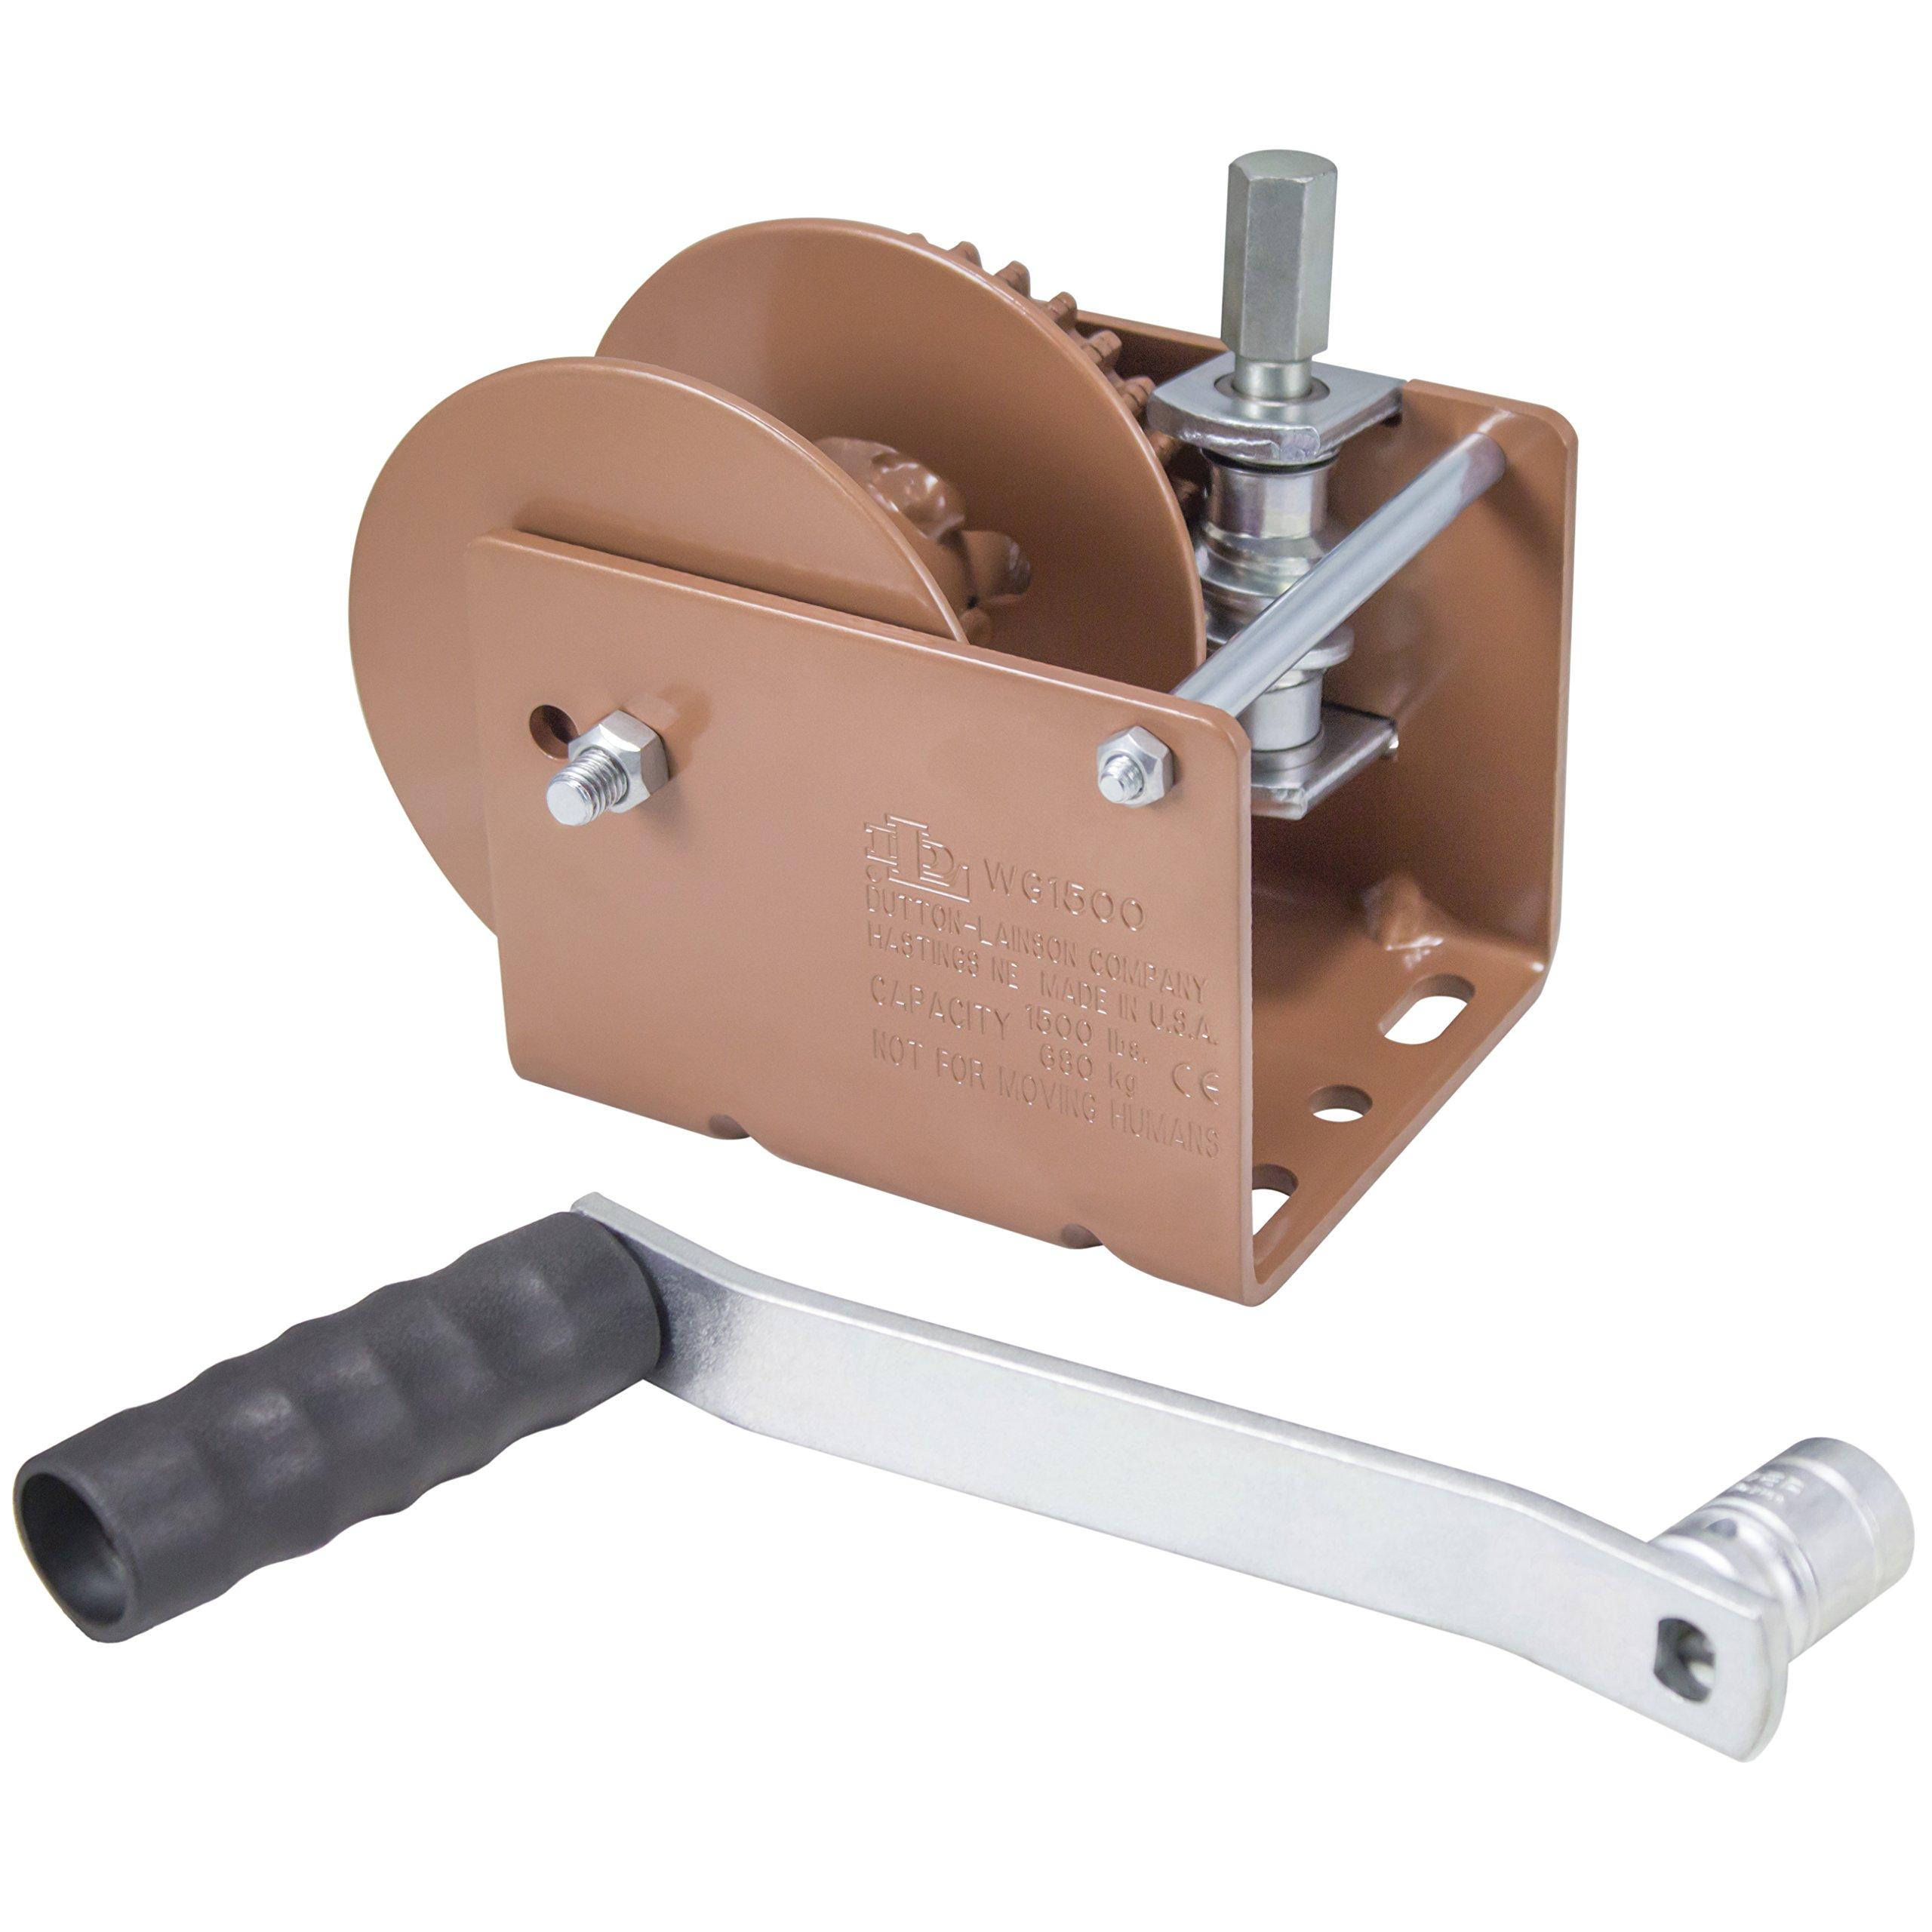 Dutton-Lainson Company WG1500HD 1500 lbs Worm Gear Winch with Hex Drive by Dutton-Lainson Company